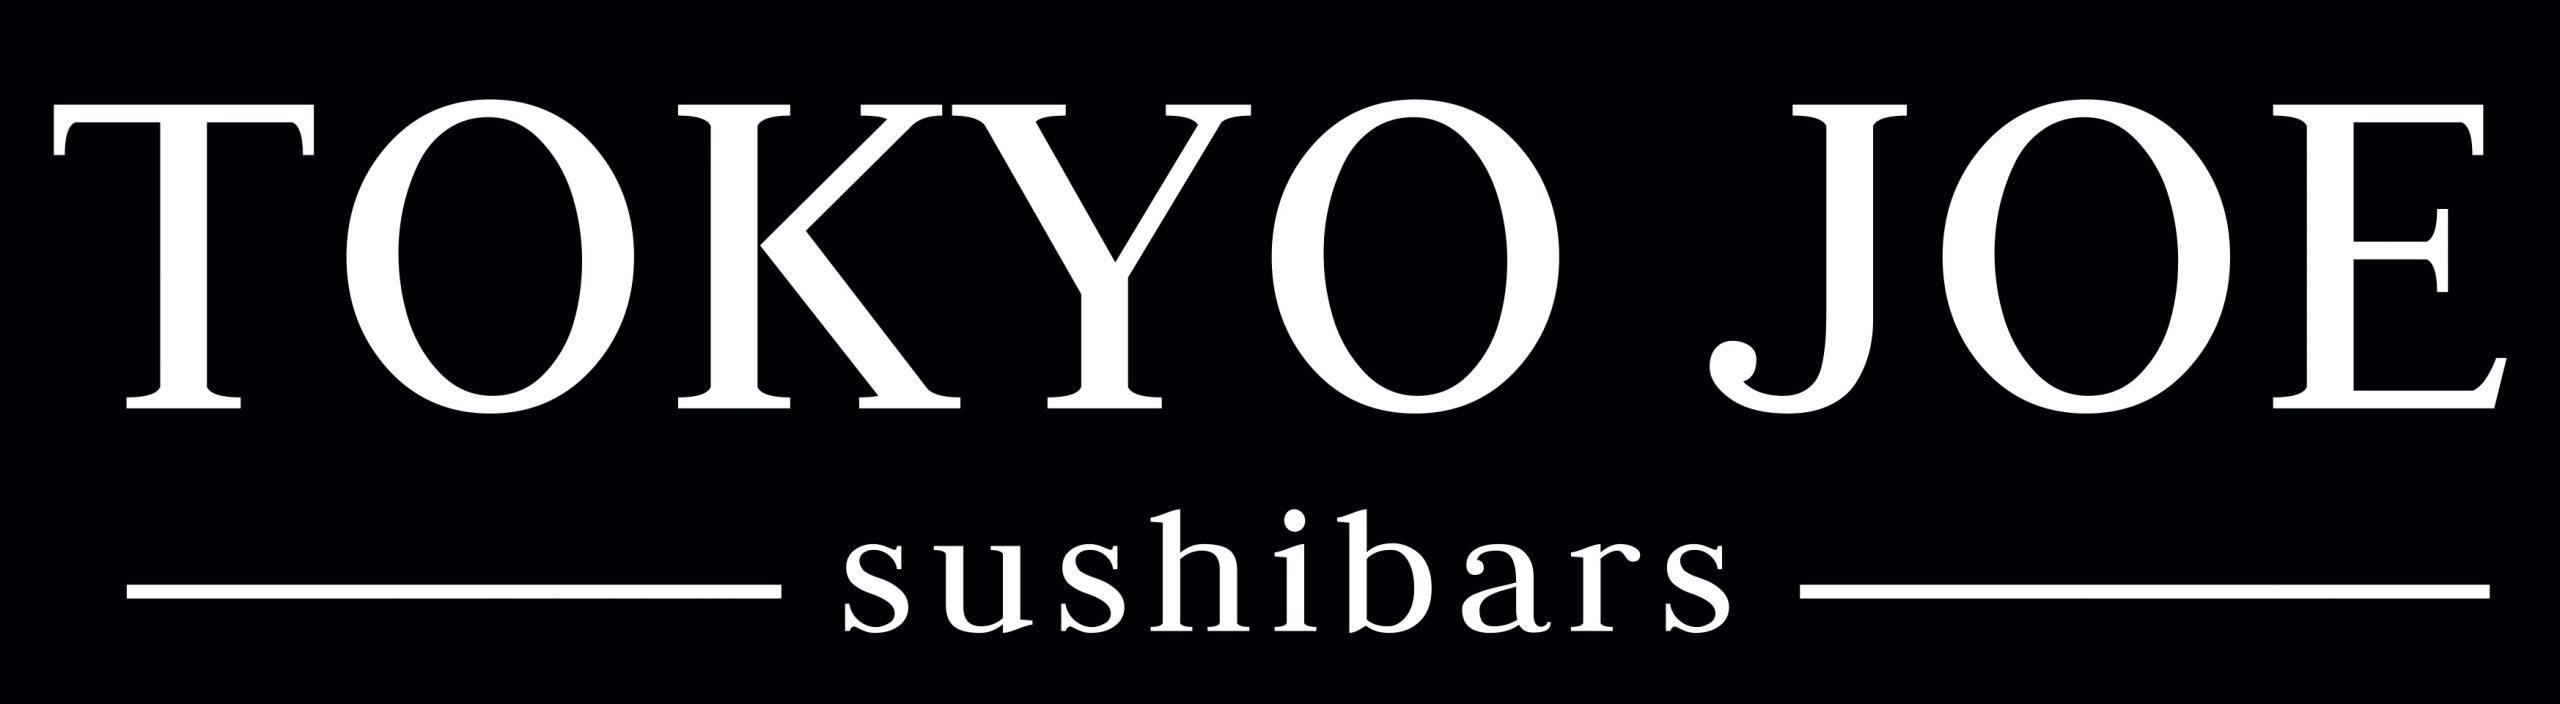 Mykonos Tokyo Joe Sushi Restaurant